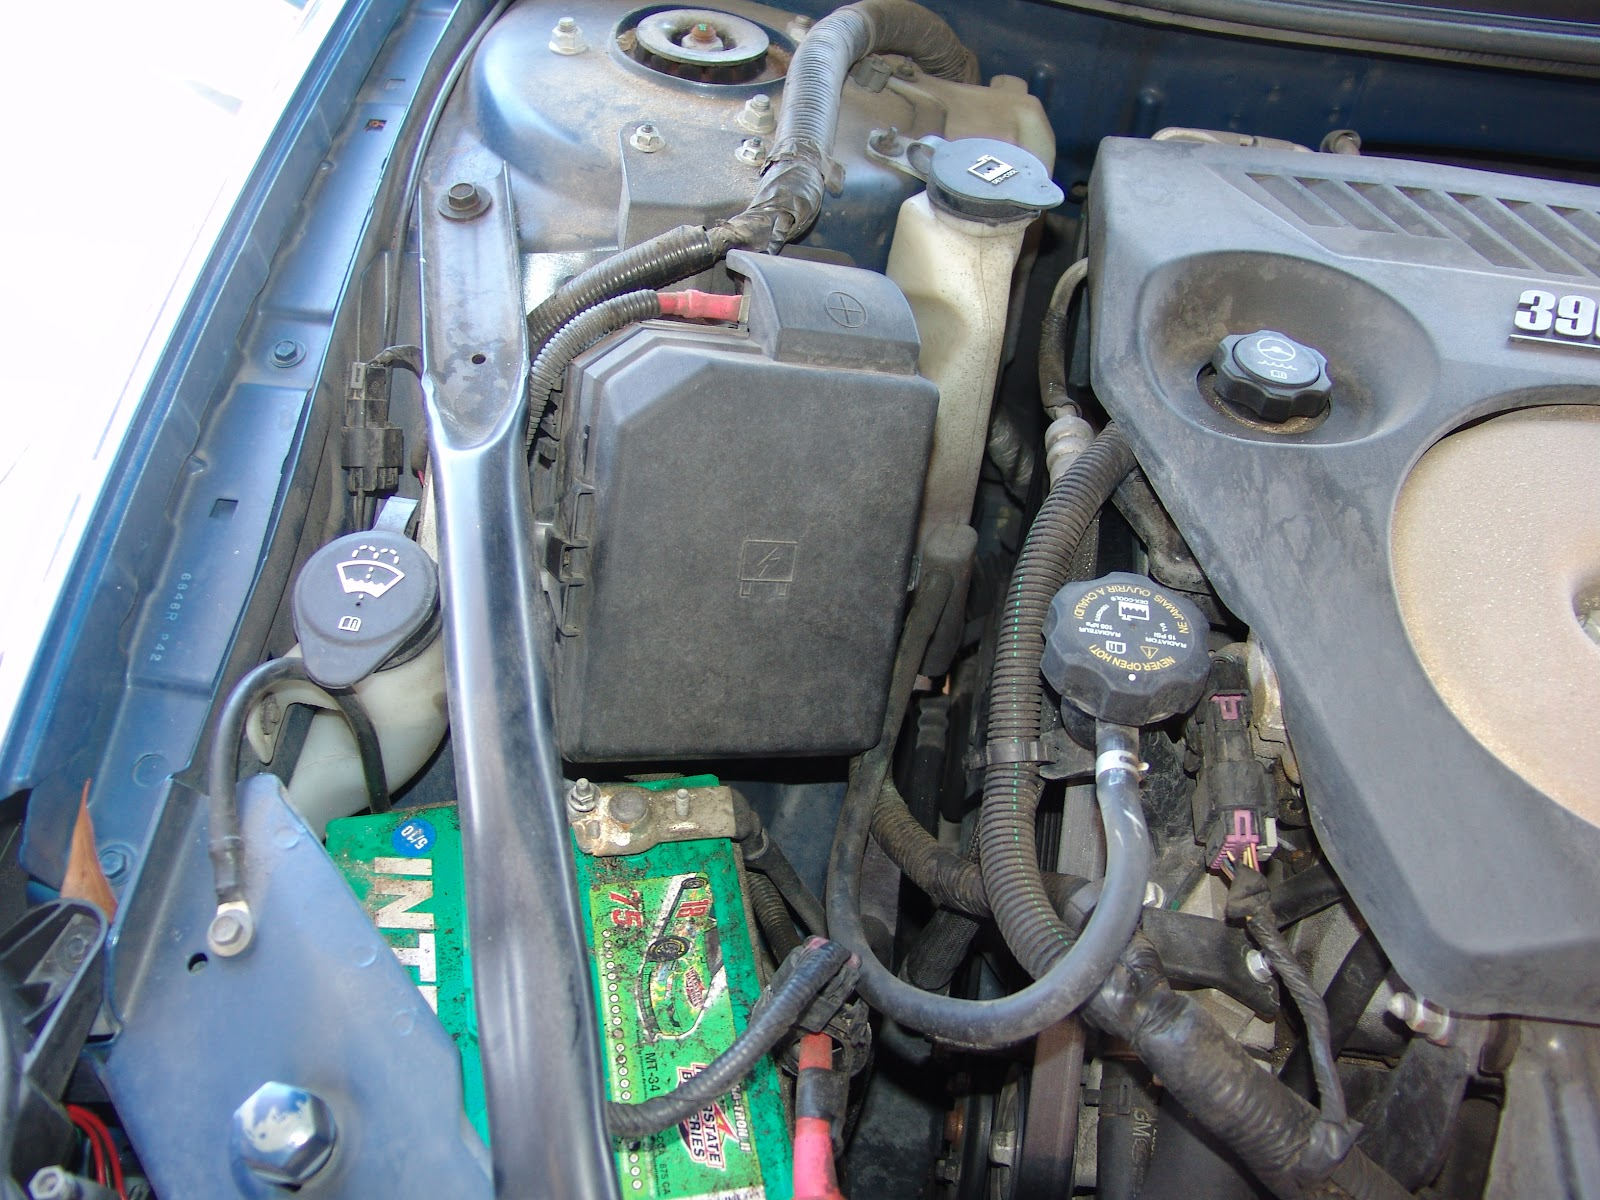 2006 Honda Civic Abs Wiring Diagram Cat Muscle Anatomy Impala Rear Window Defogger Get Free